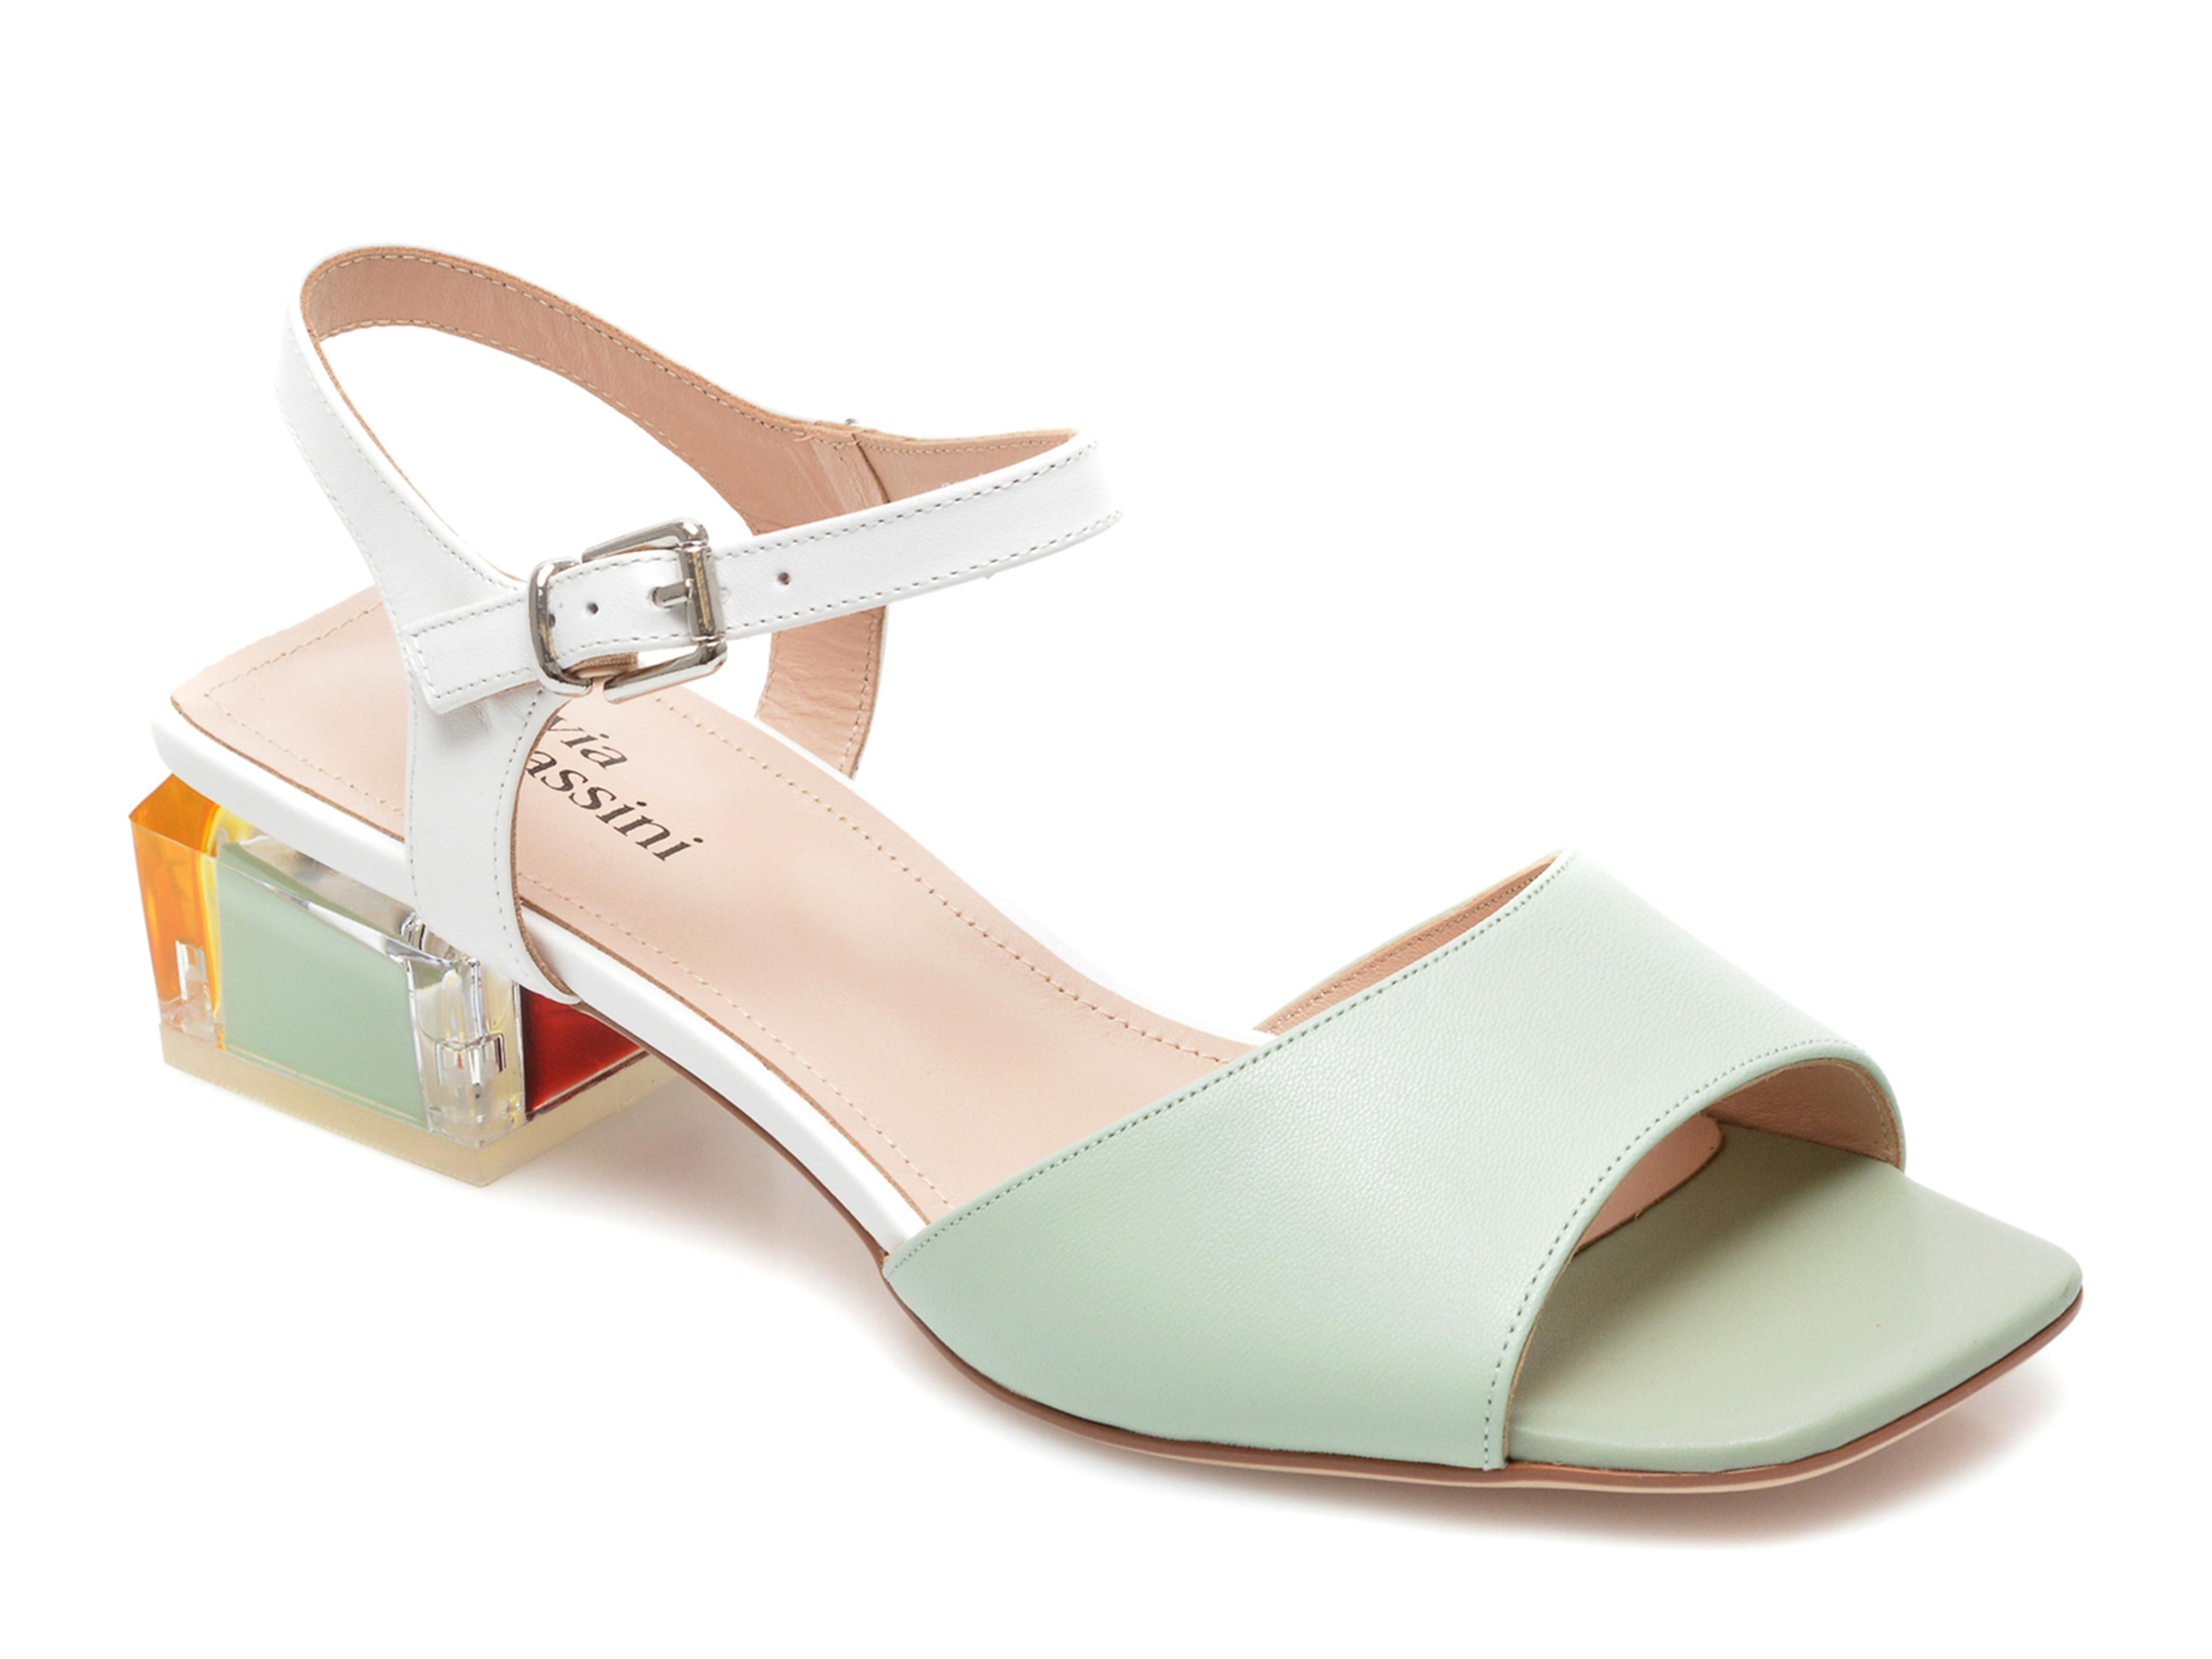 Sandale FLAVIA PASSINI verzi, H6736, din piele naturala